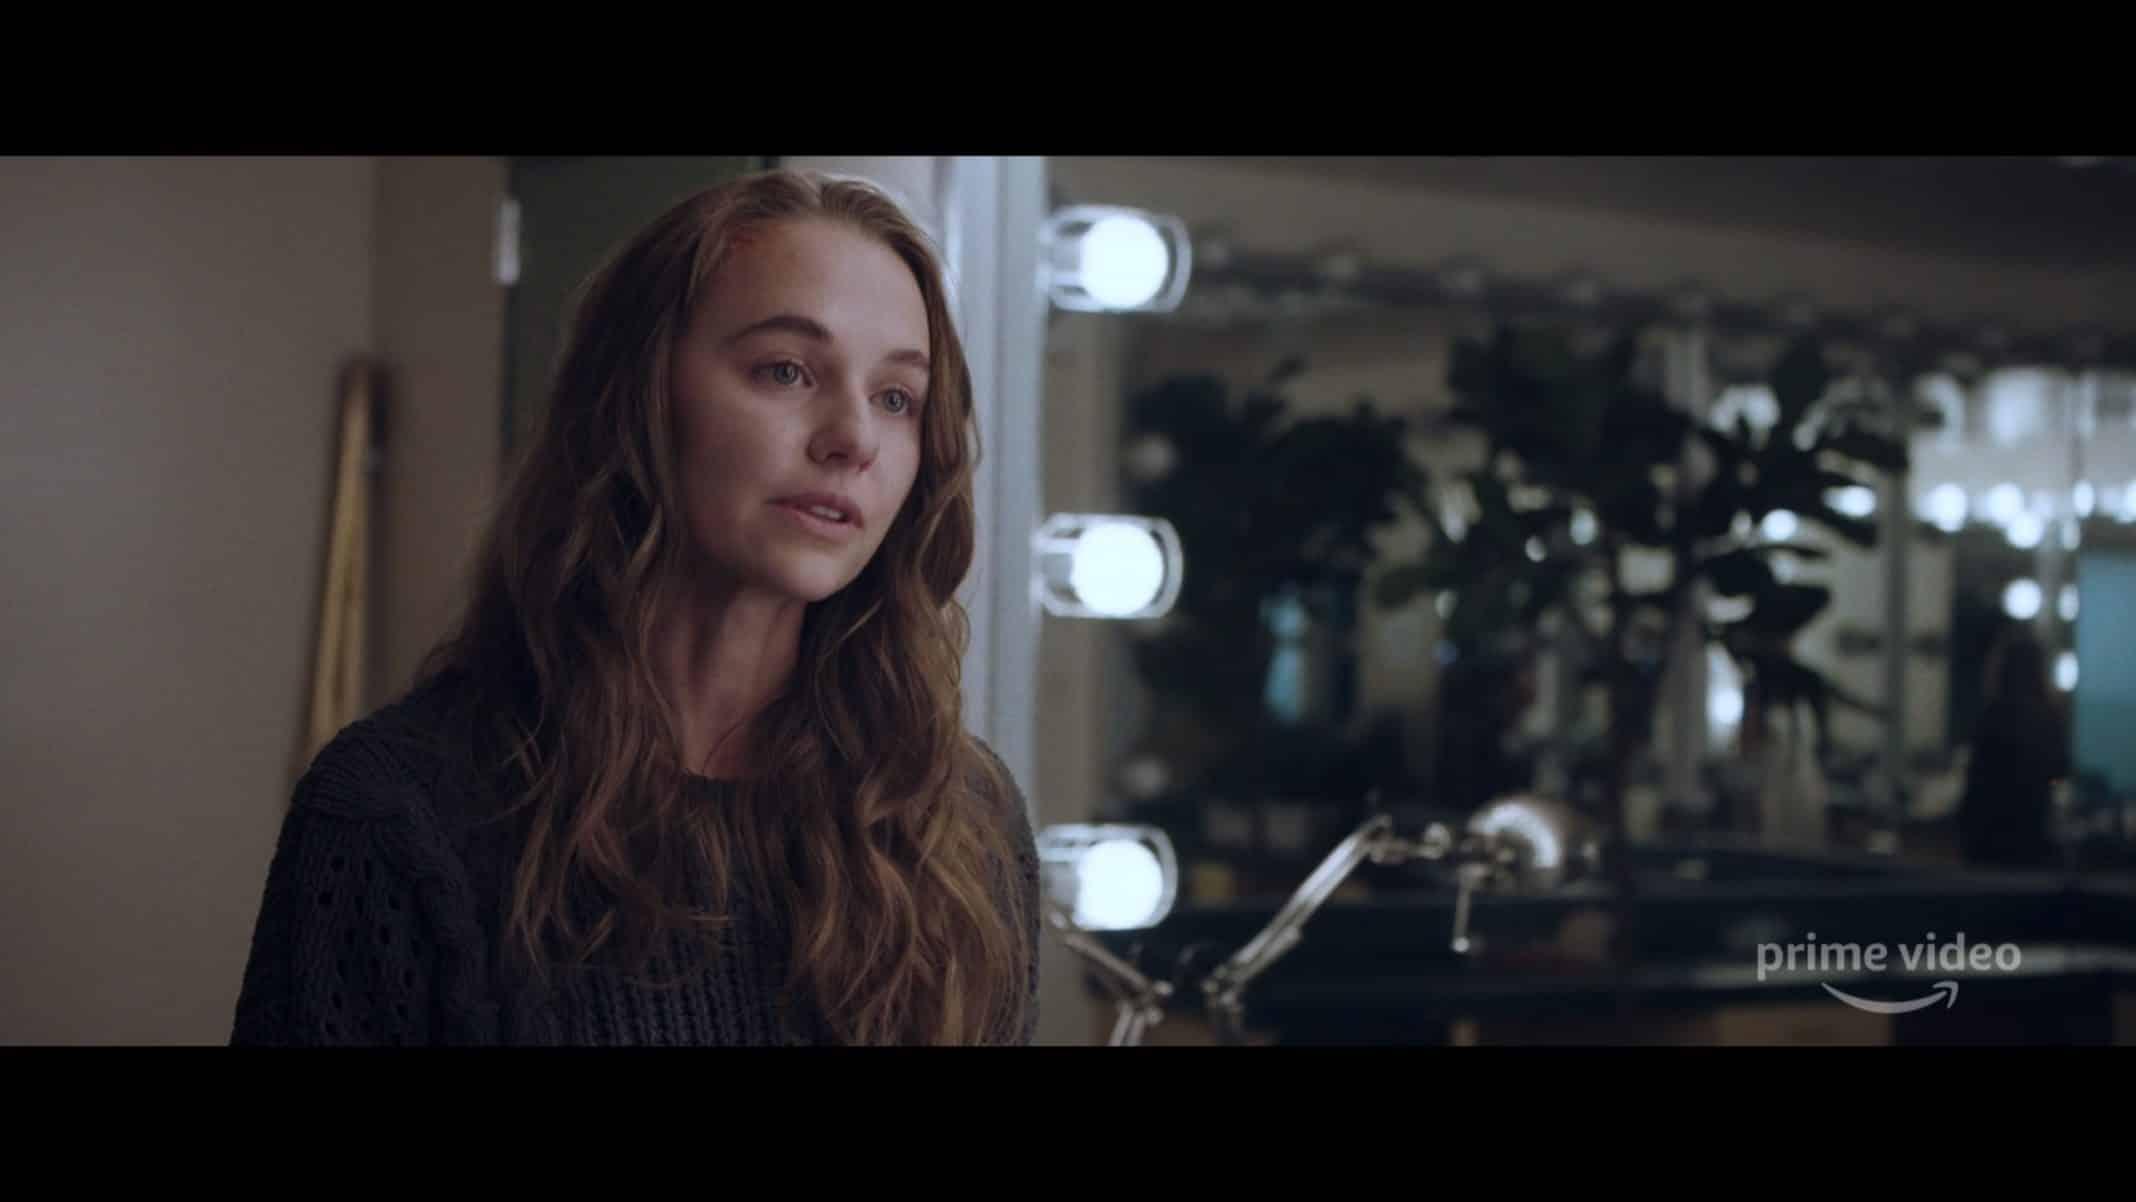 Vivian (Madison Iseman) in a dressing room.